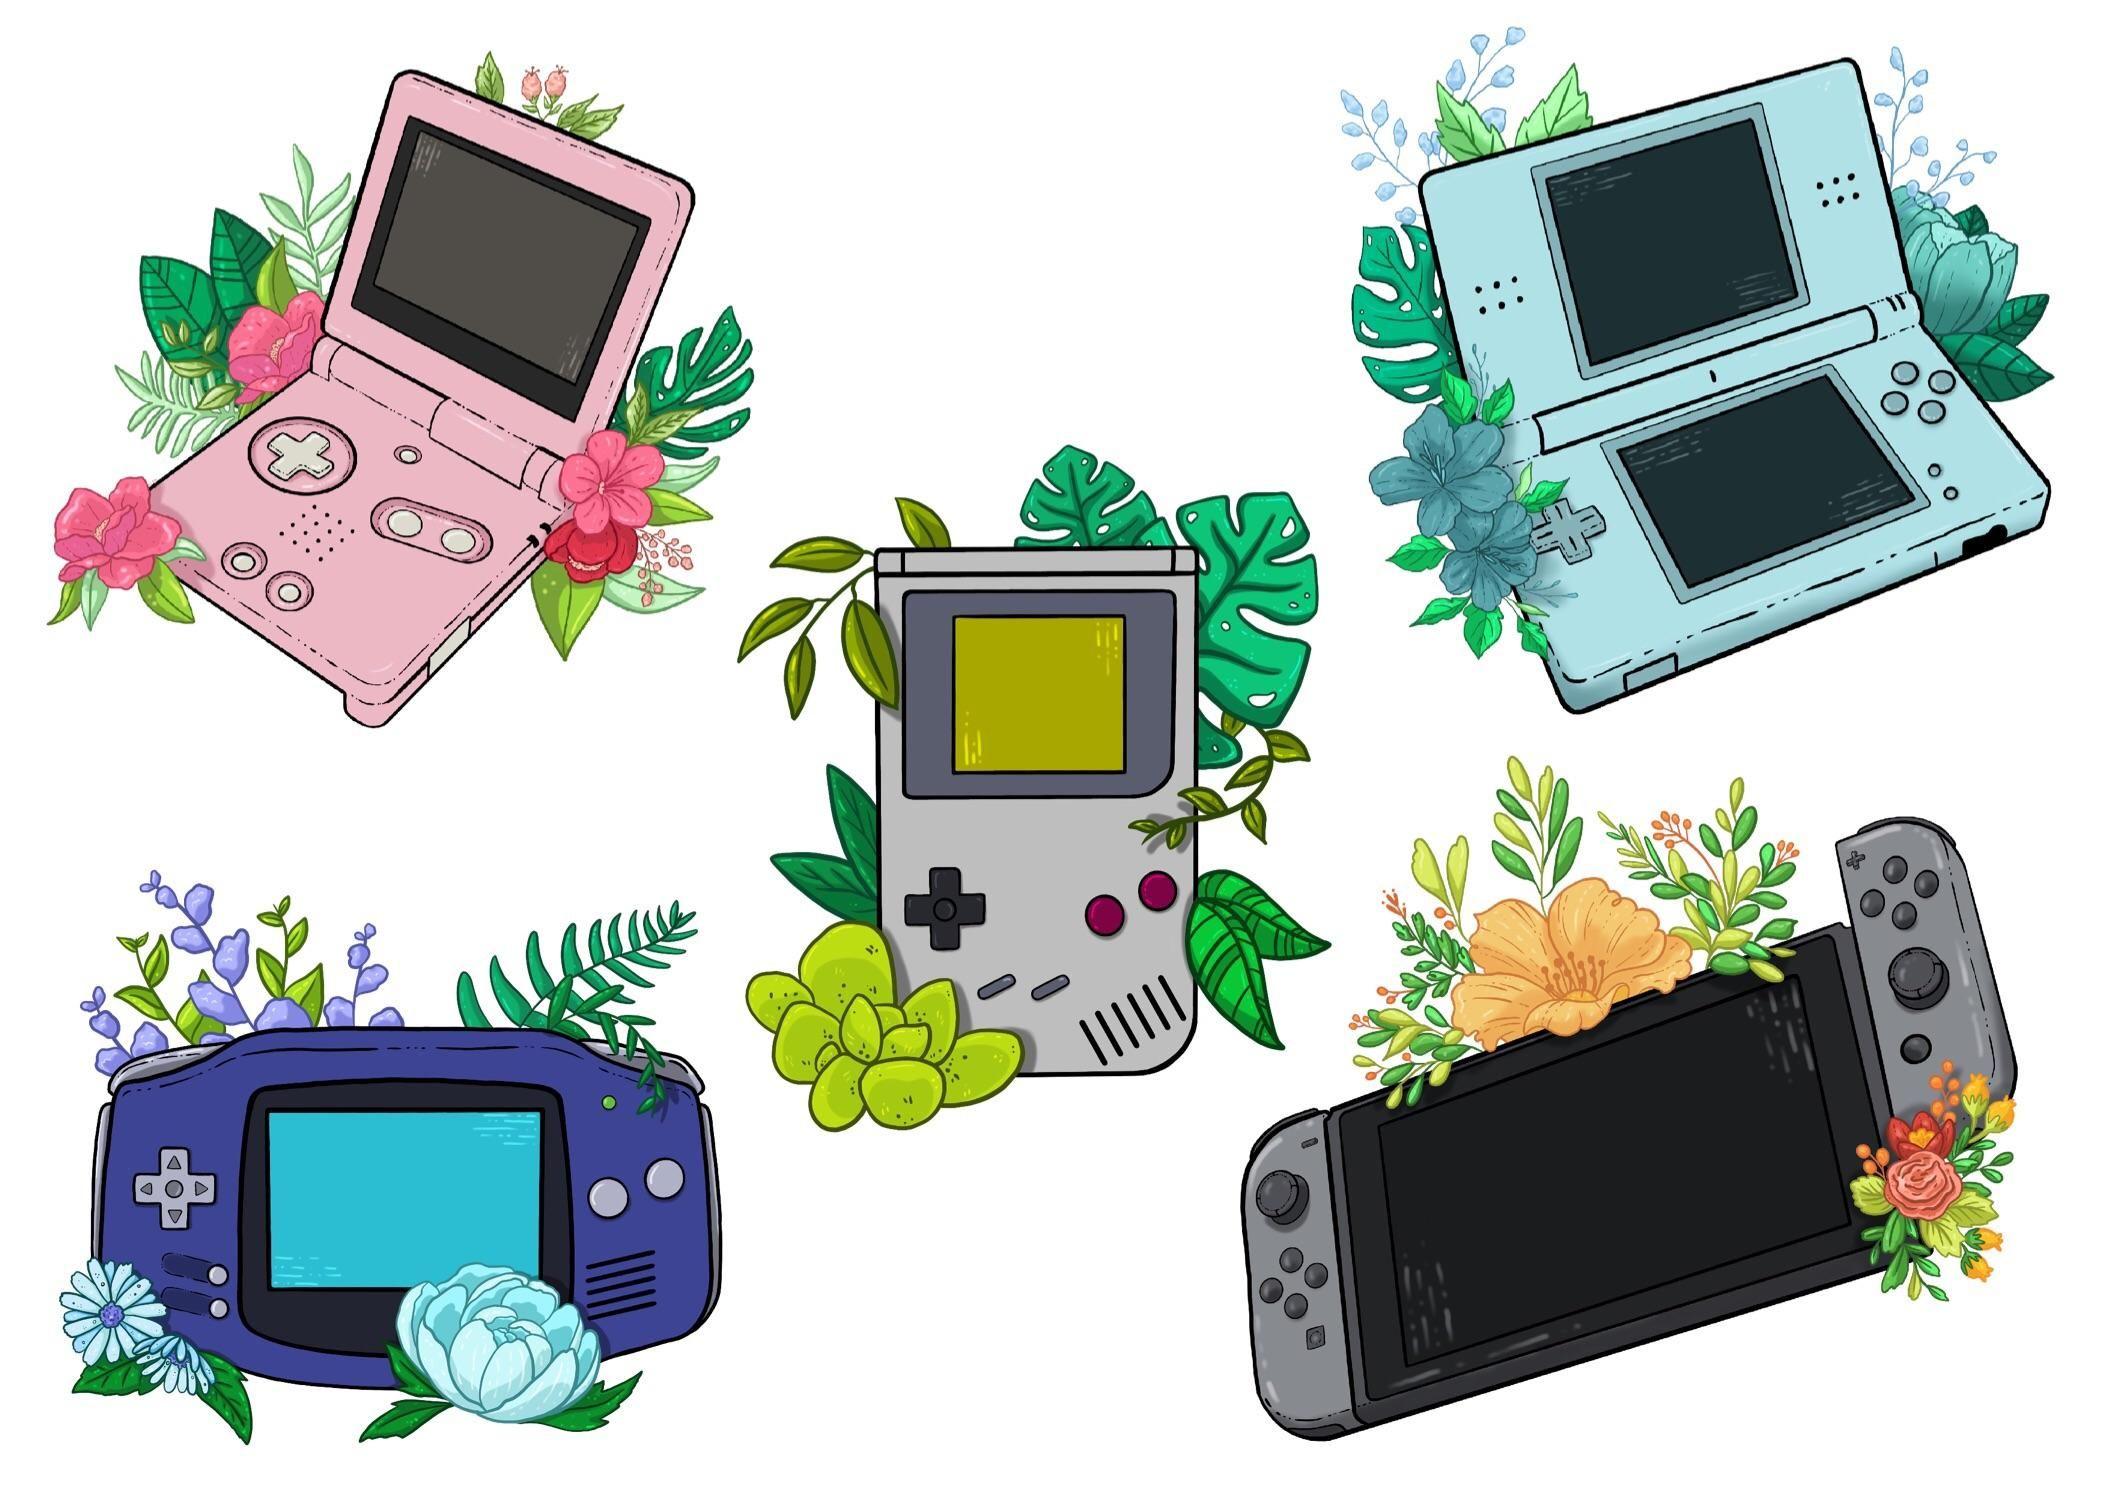 """ Retro evolution "" drawing Nintendo, Gameboy advance"